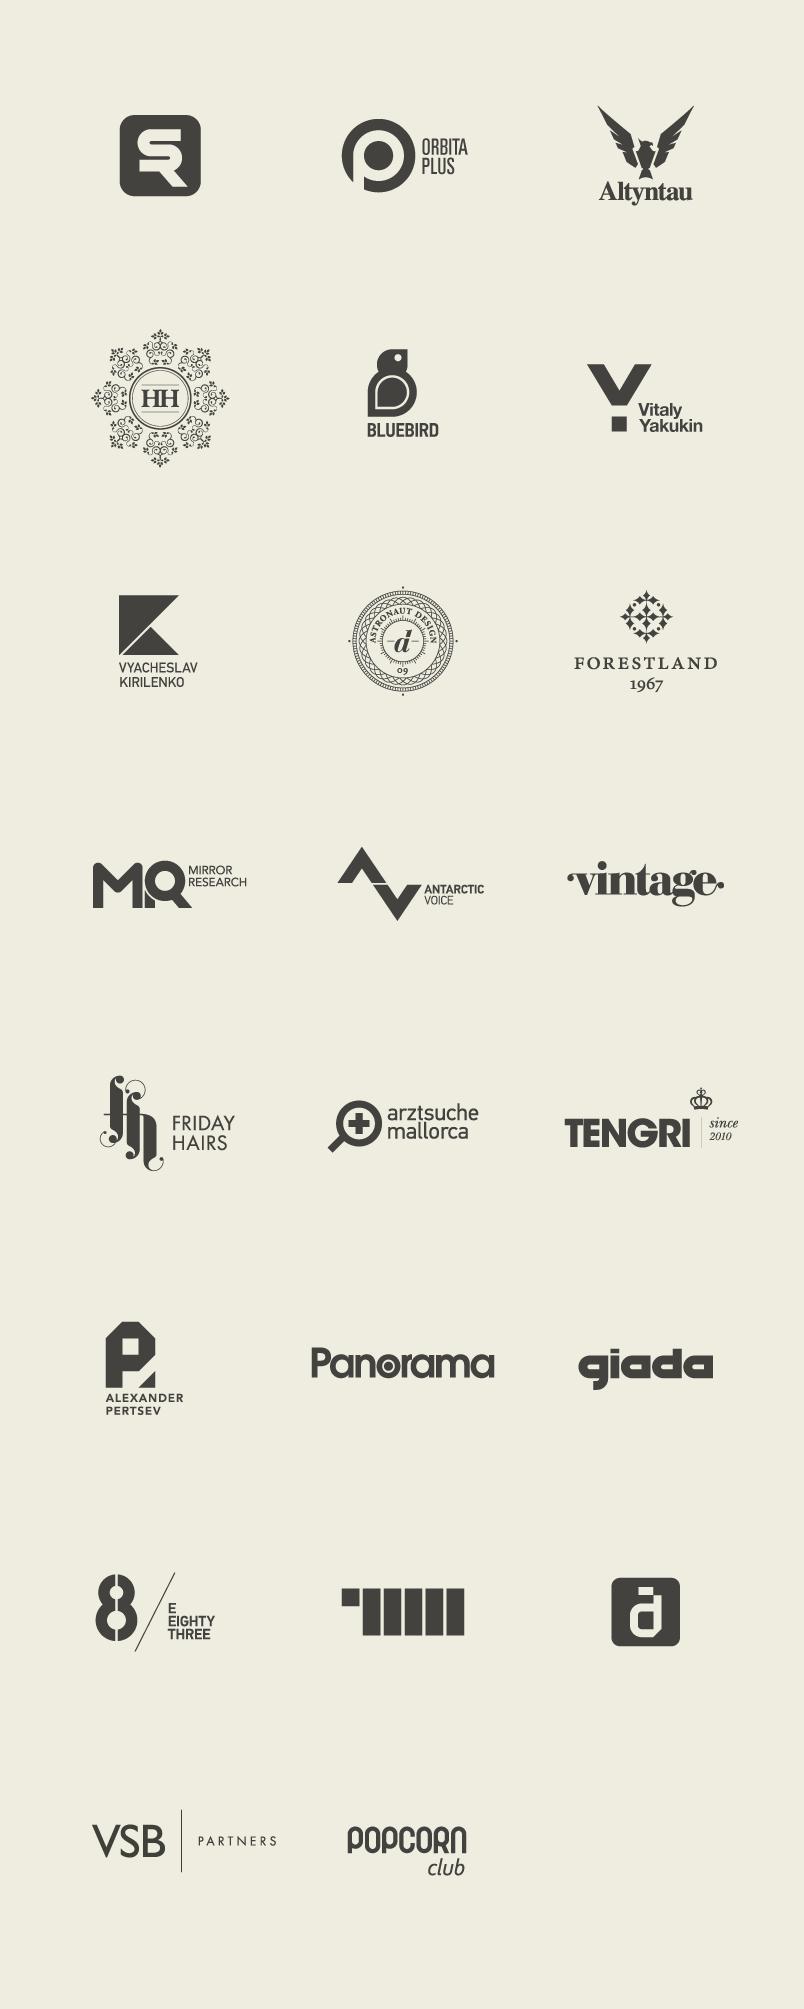 for doing flat design right Astronaut Design and Typography (Vyacheslav Kirilenko) – logo setAstronaut Design and Typography (Vyacheslav Kirilenko) – logo set